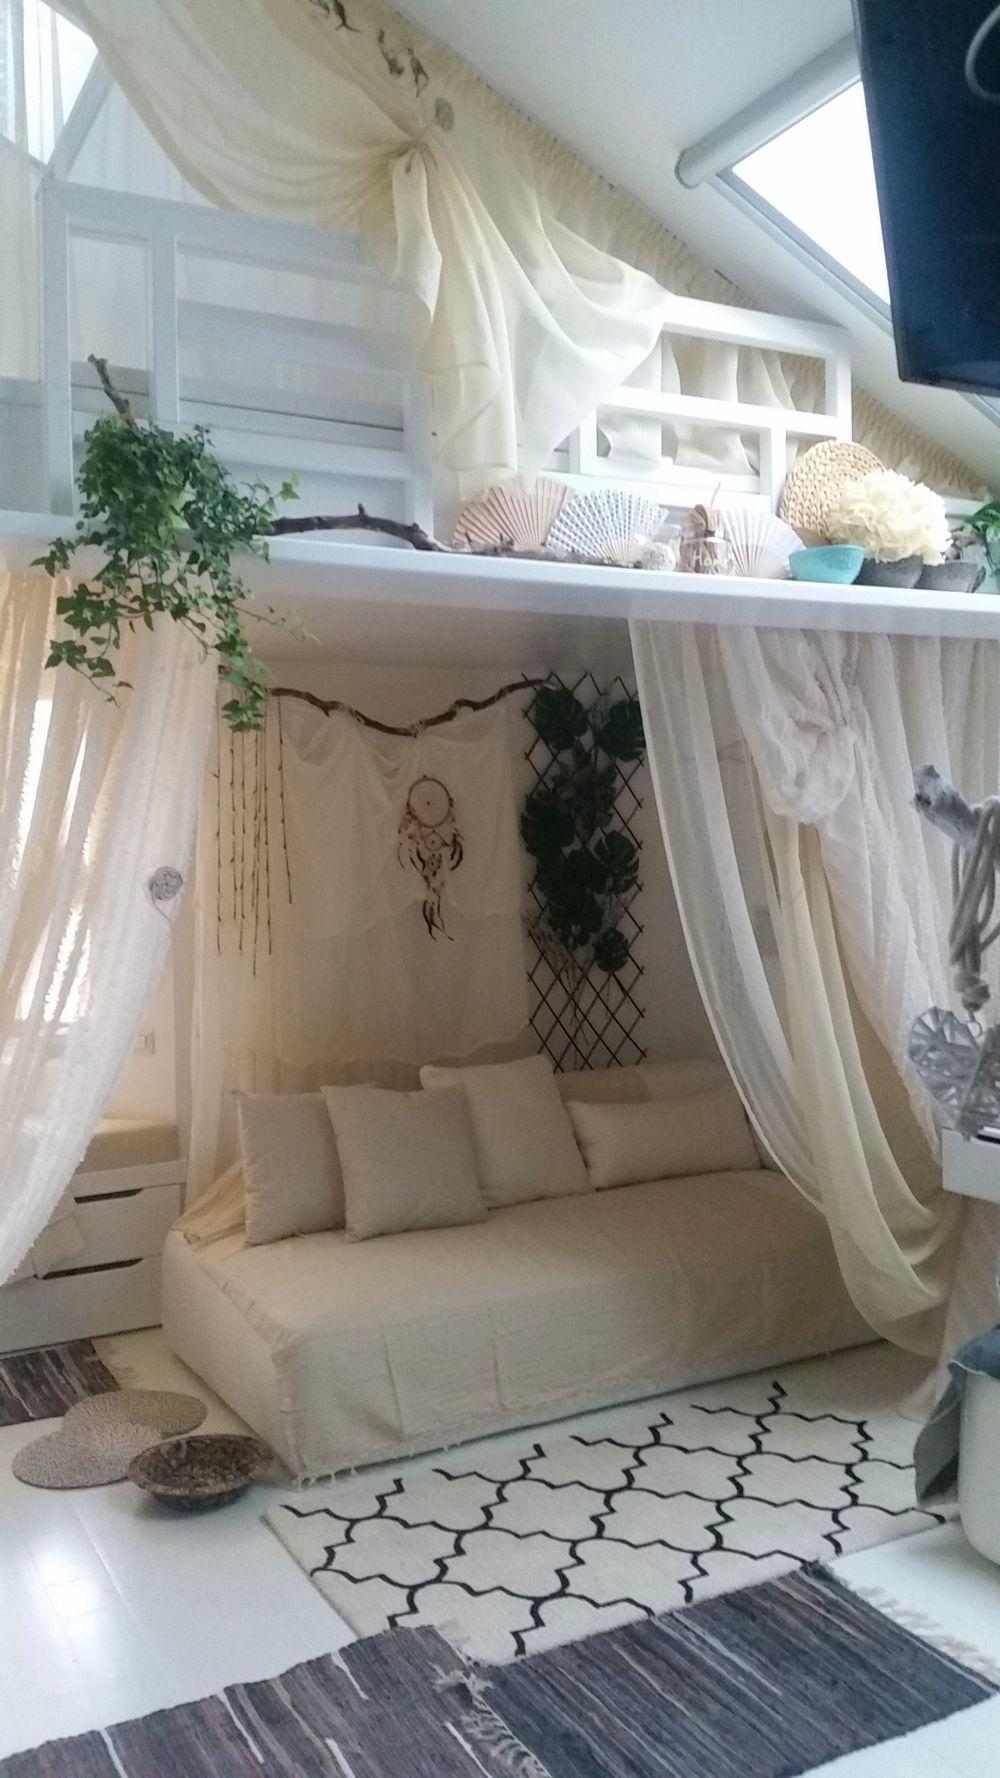 adelaparvu.com despre amenajare camera adolescenta Bucuresti, Romania, stil BoHo chic, Designer Adela Parvu, Foto Adela Parvu (31)